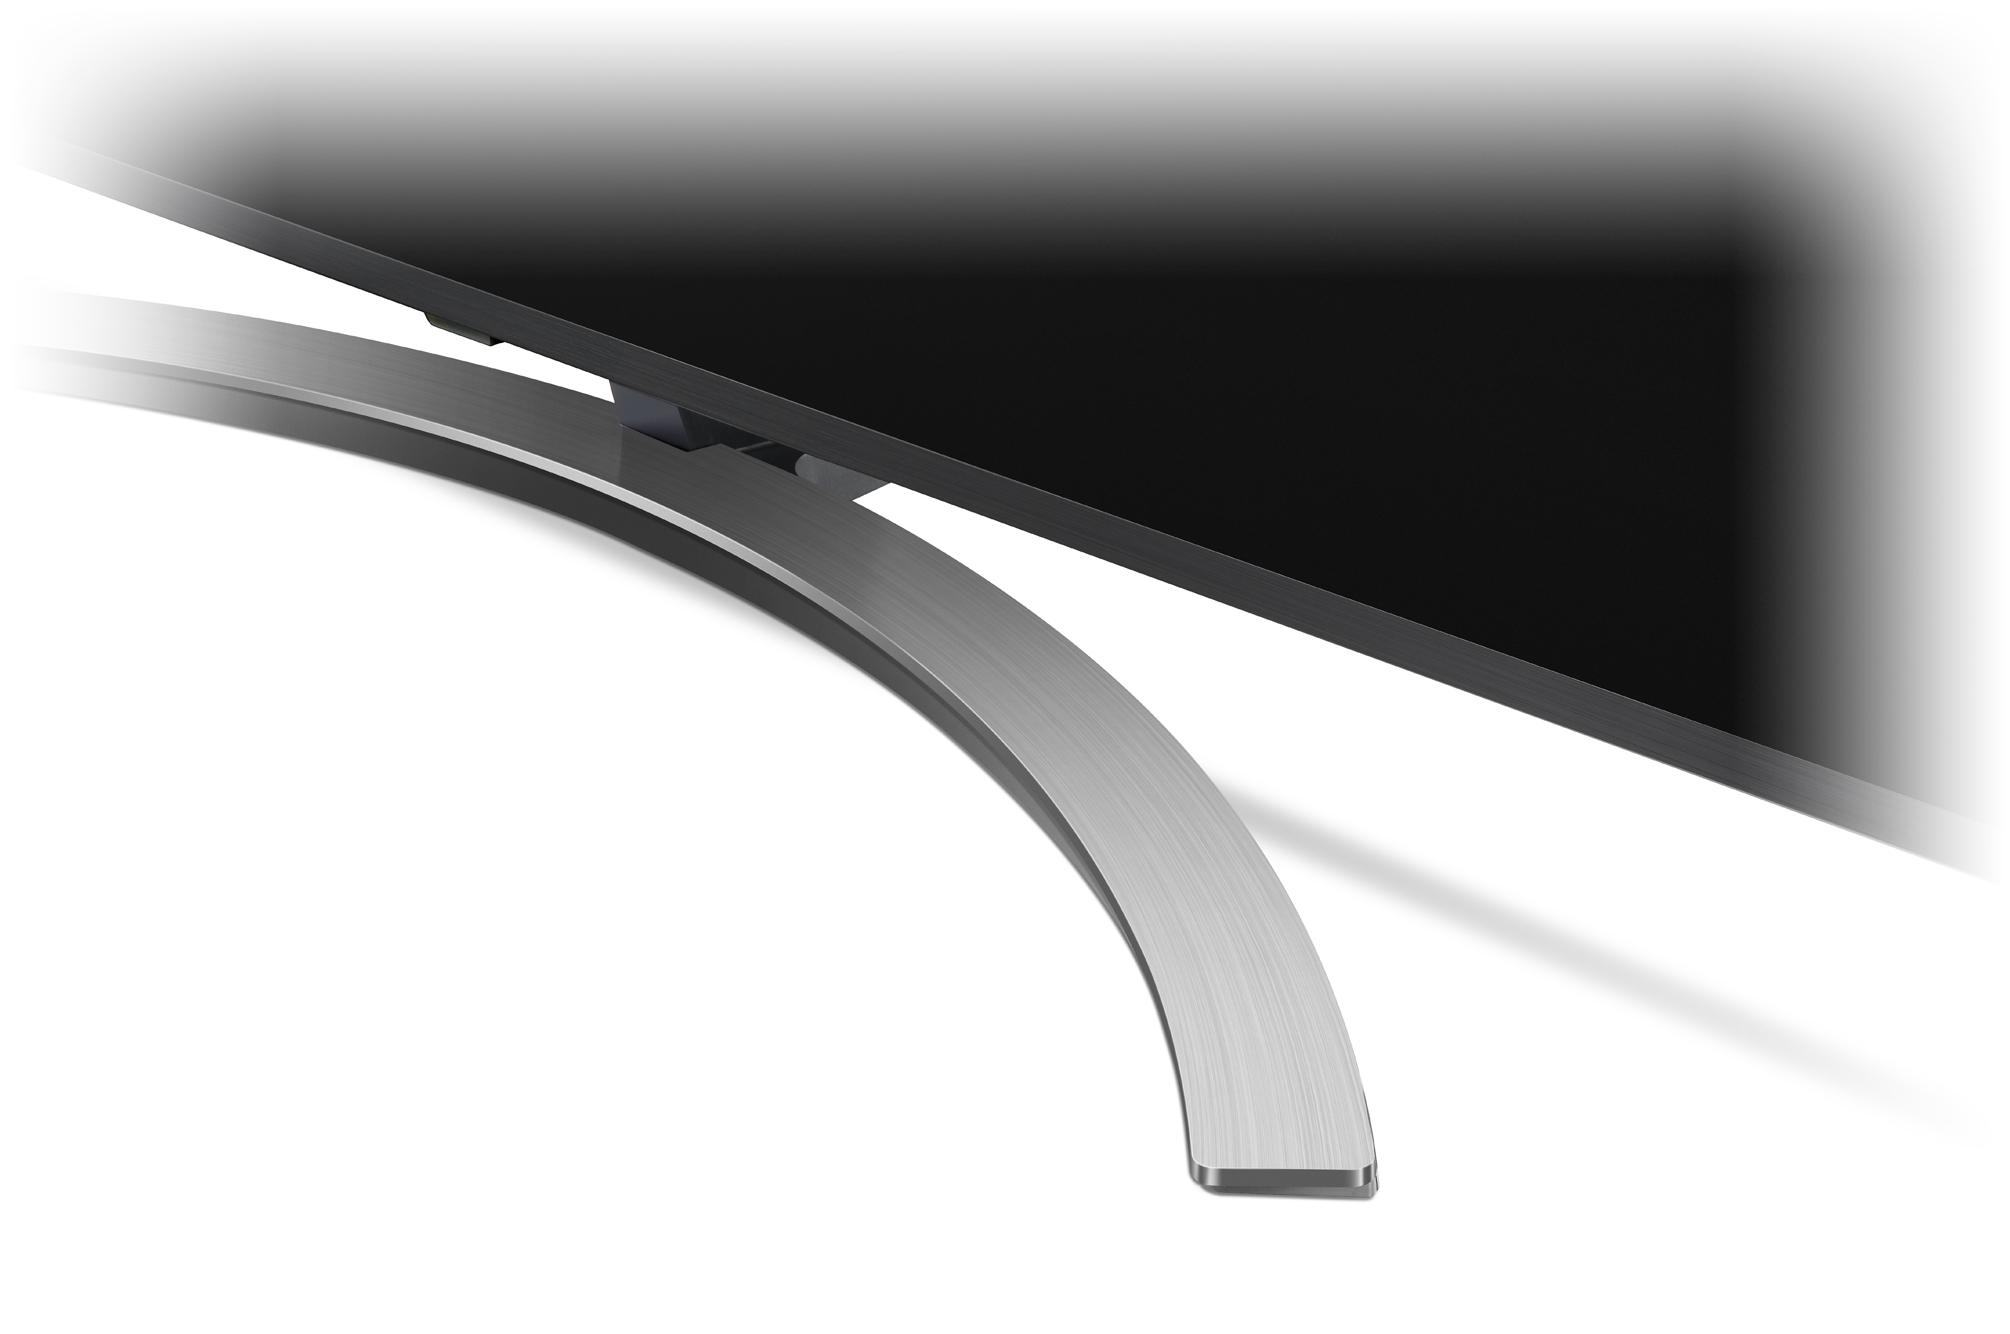 LG Pro:Centric SMART 65UT761H (EU)